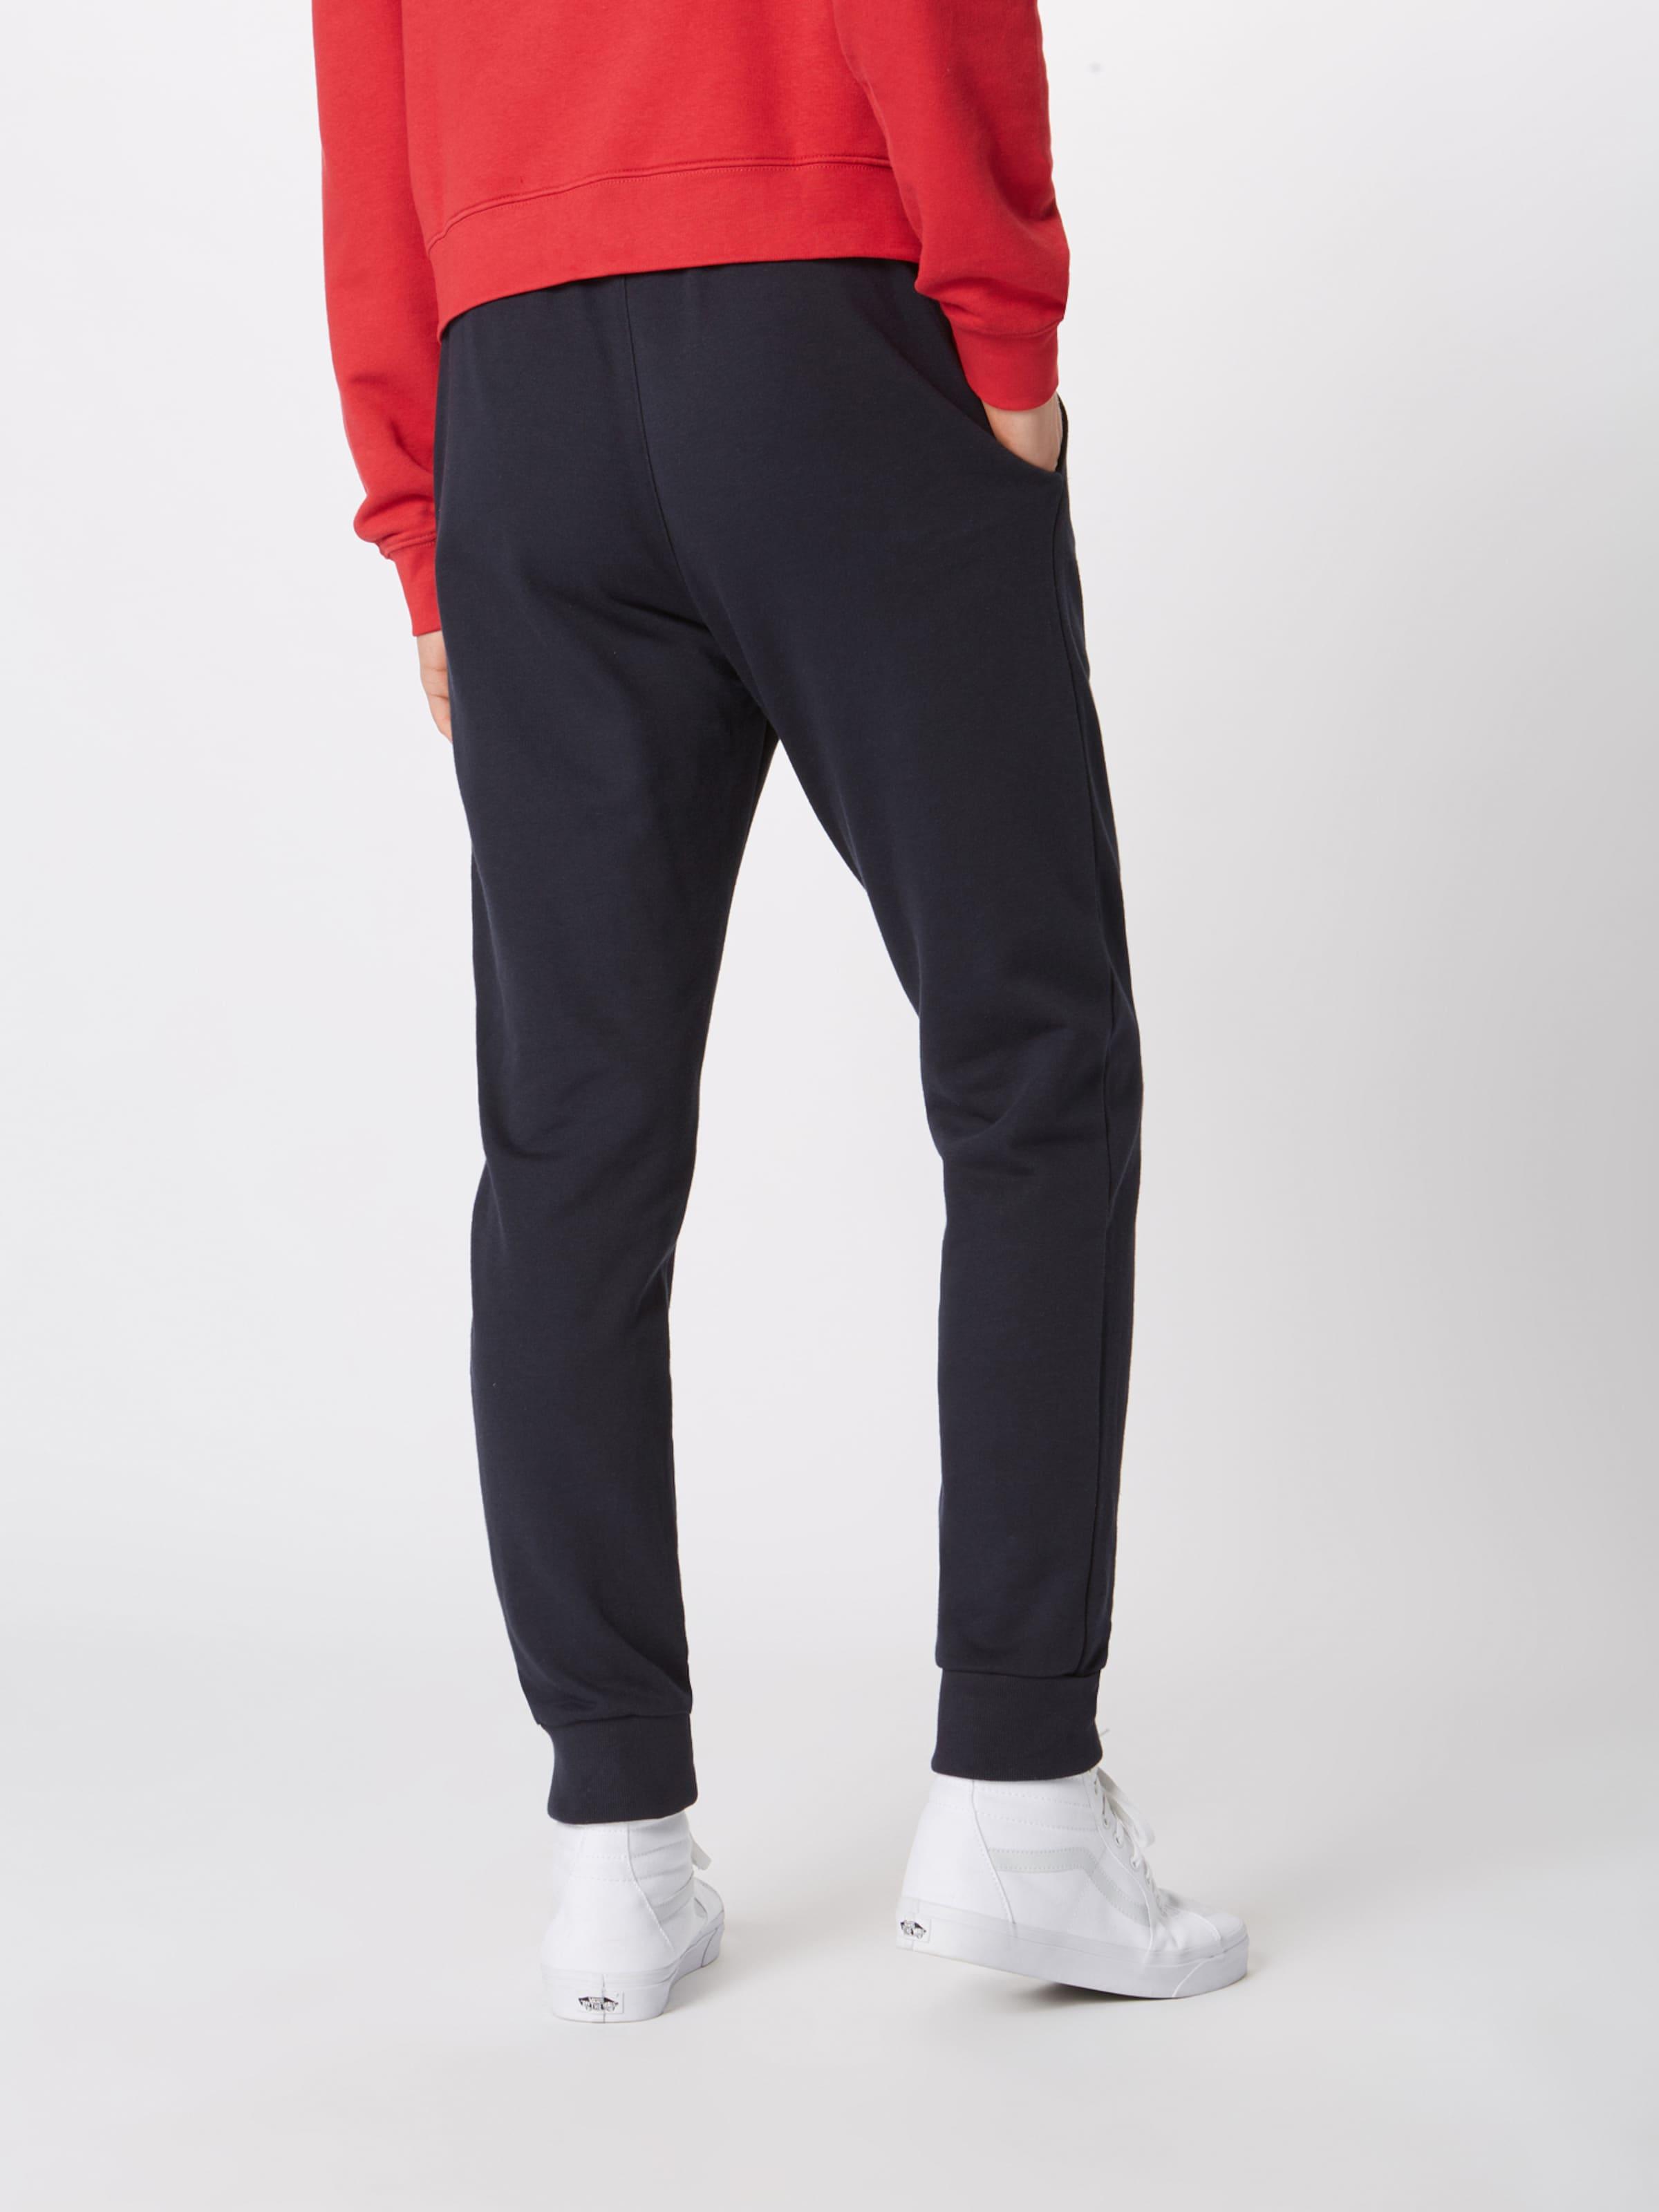 Apparel Foncé Pantalon Champion Bleu En Authentic Athletic wX8kOn0P